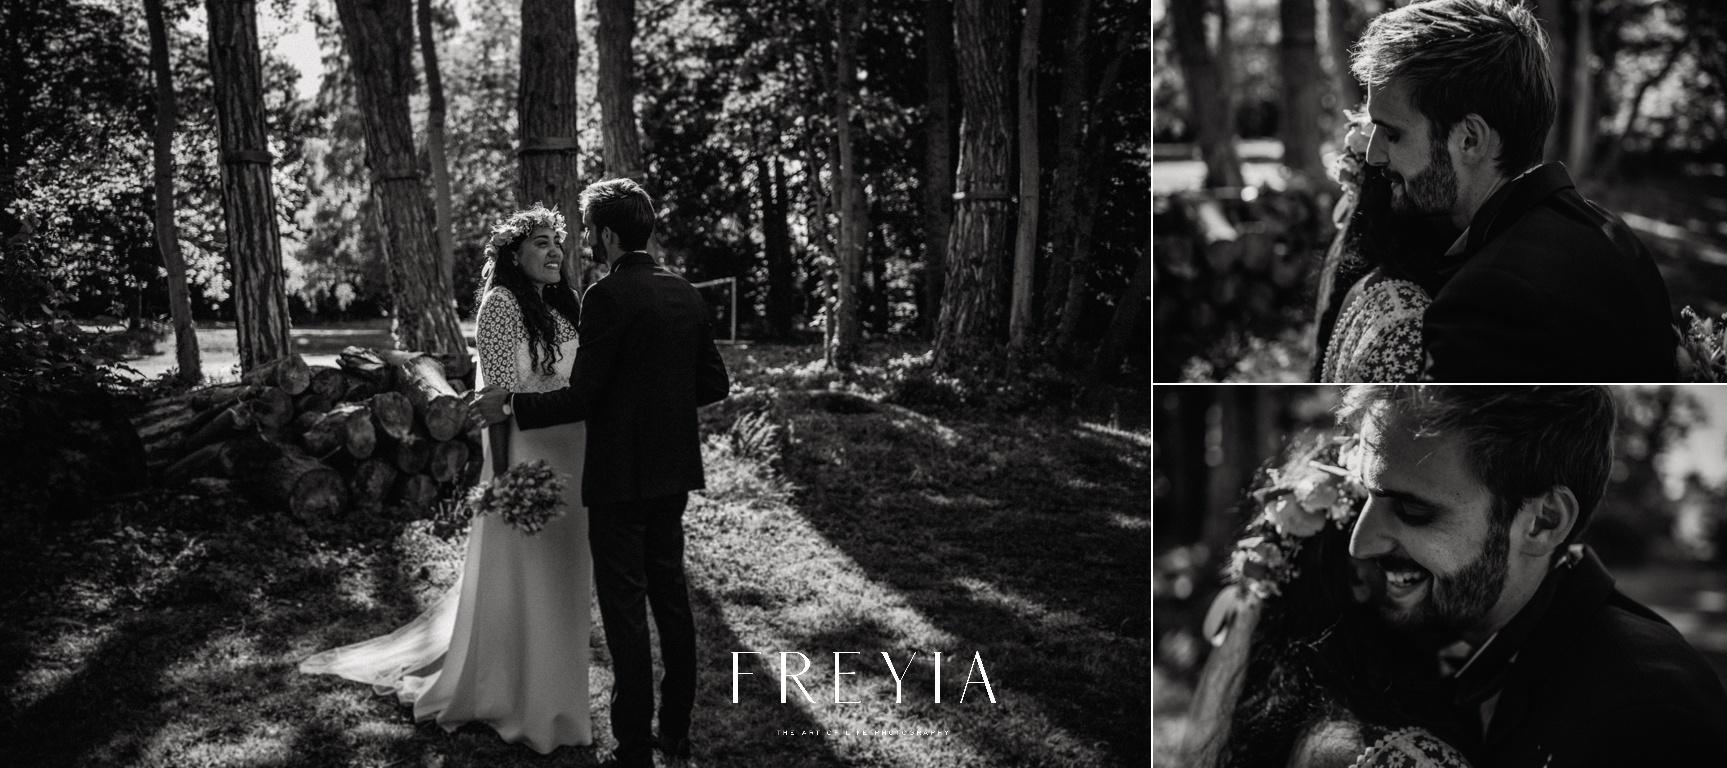 R + T |  mariage reportage alternatif moody intime minimaliste vintage naturel boho boheme |  PHOTOGRAPHE mariage PARIS france destination  | FREYIA photography_-227.jpg